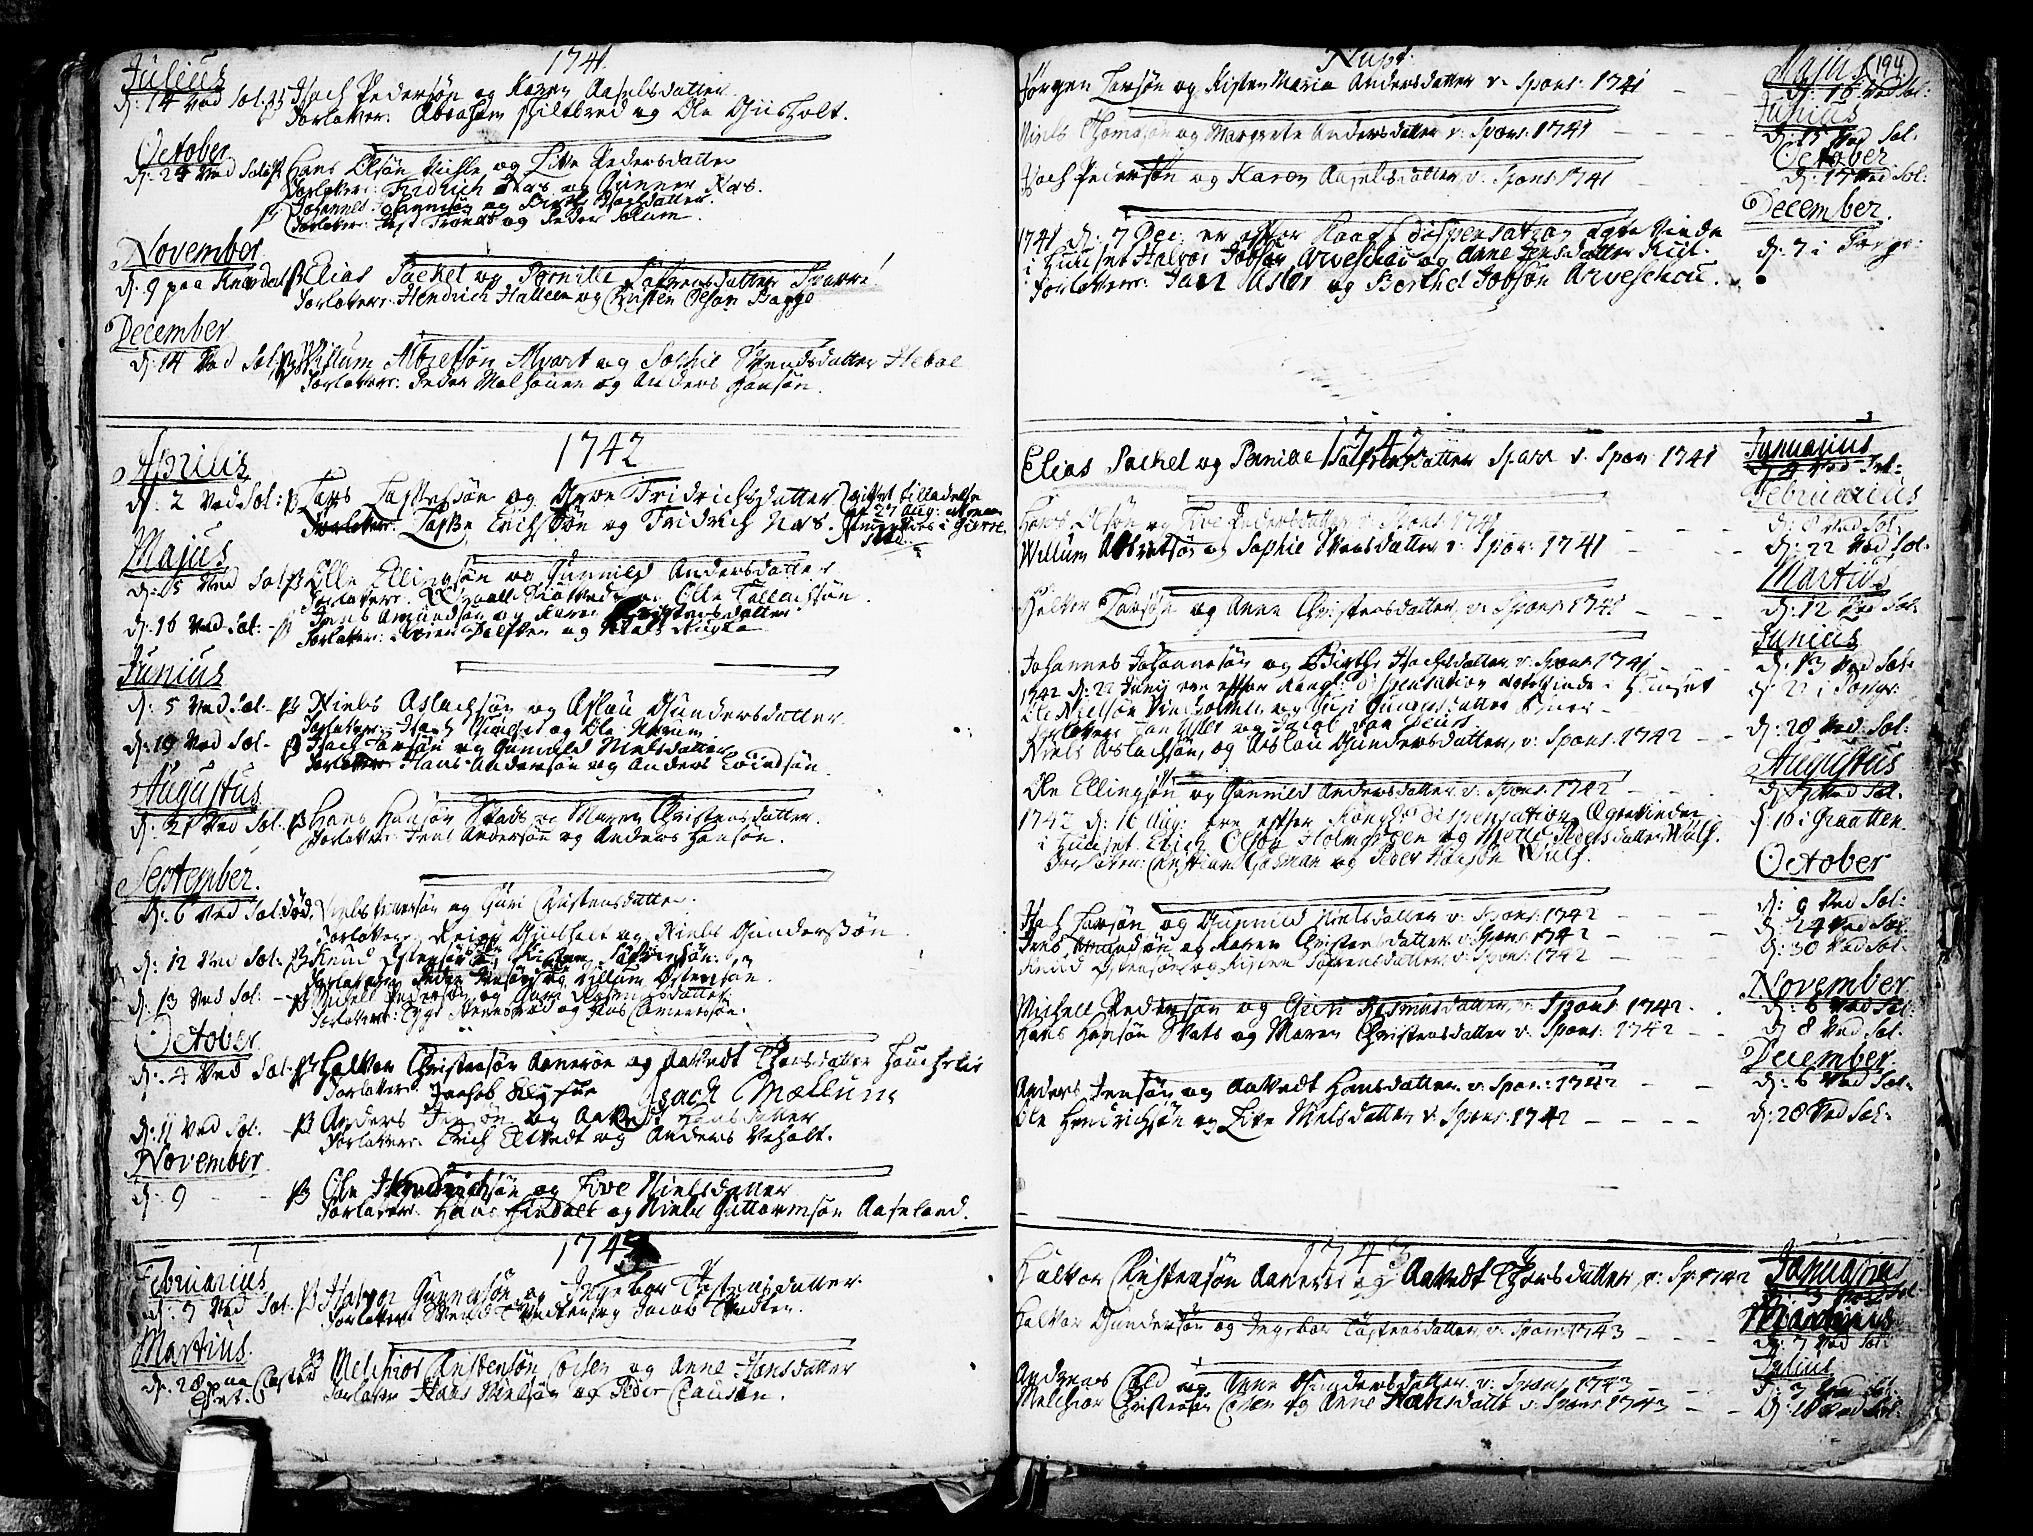 SAKO, Solum kirkebøker, F/Fa/L0002: Ministerialbok nr. I 2, 1713-1761, s. 194